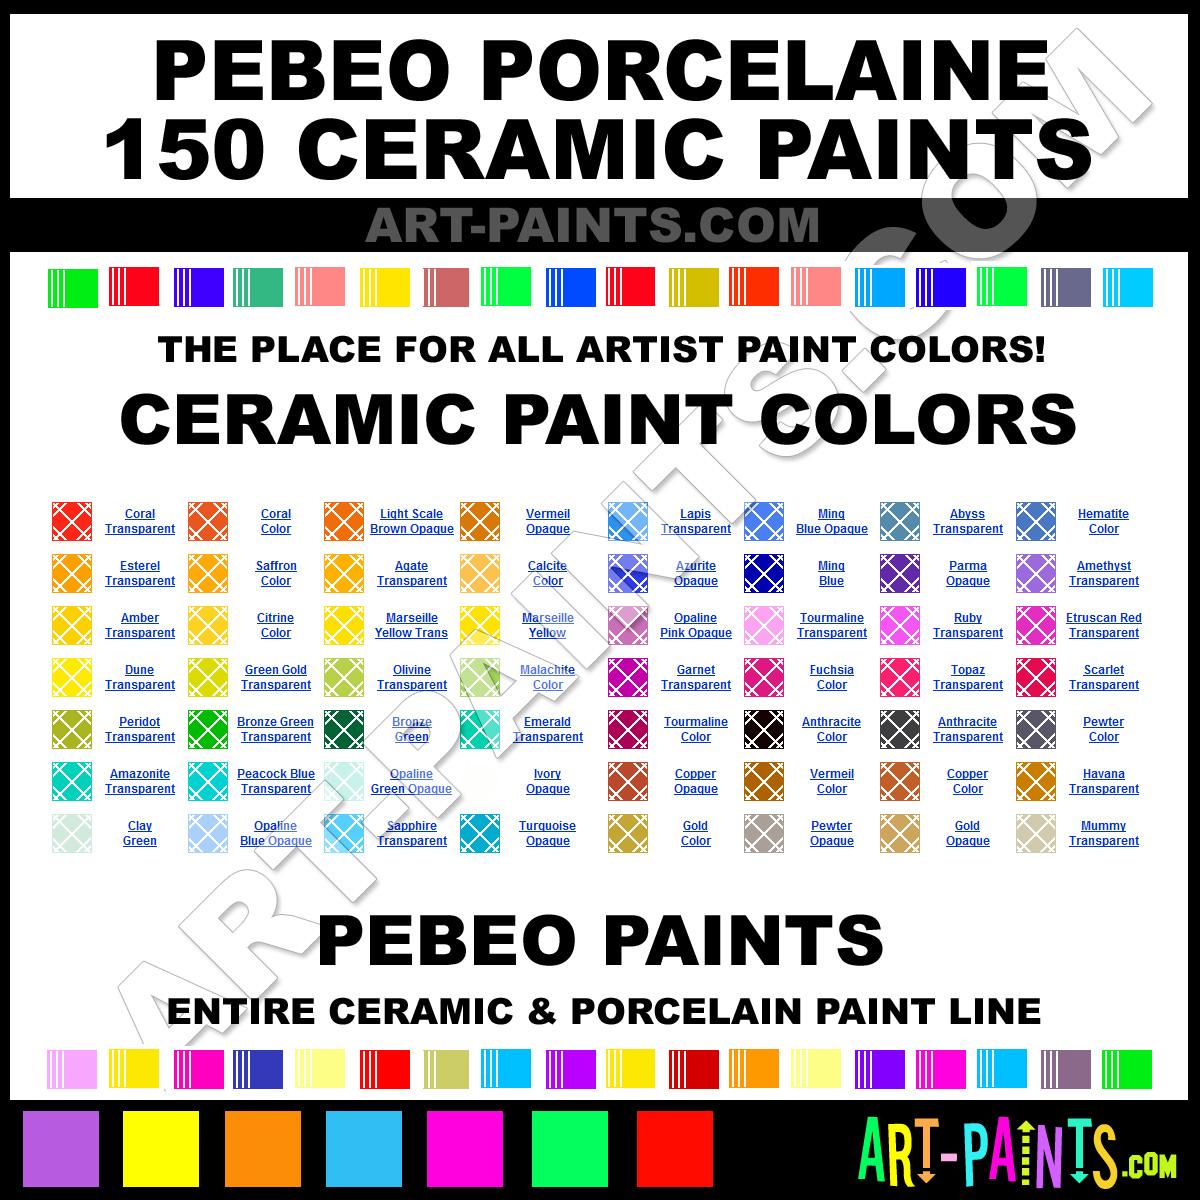 Amazonite Transparent Porcelaine 150 Ceramic Paints - 02908